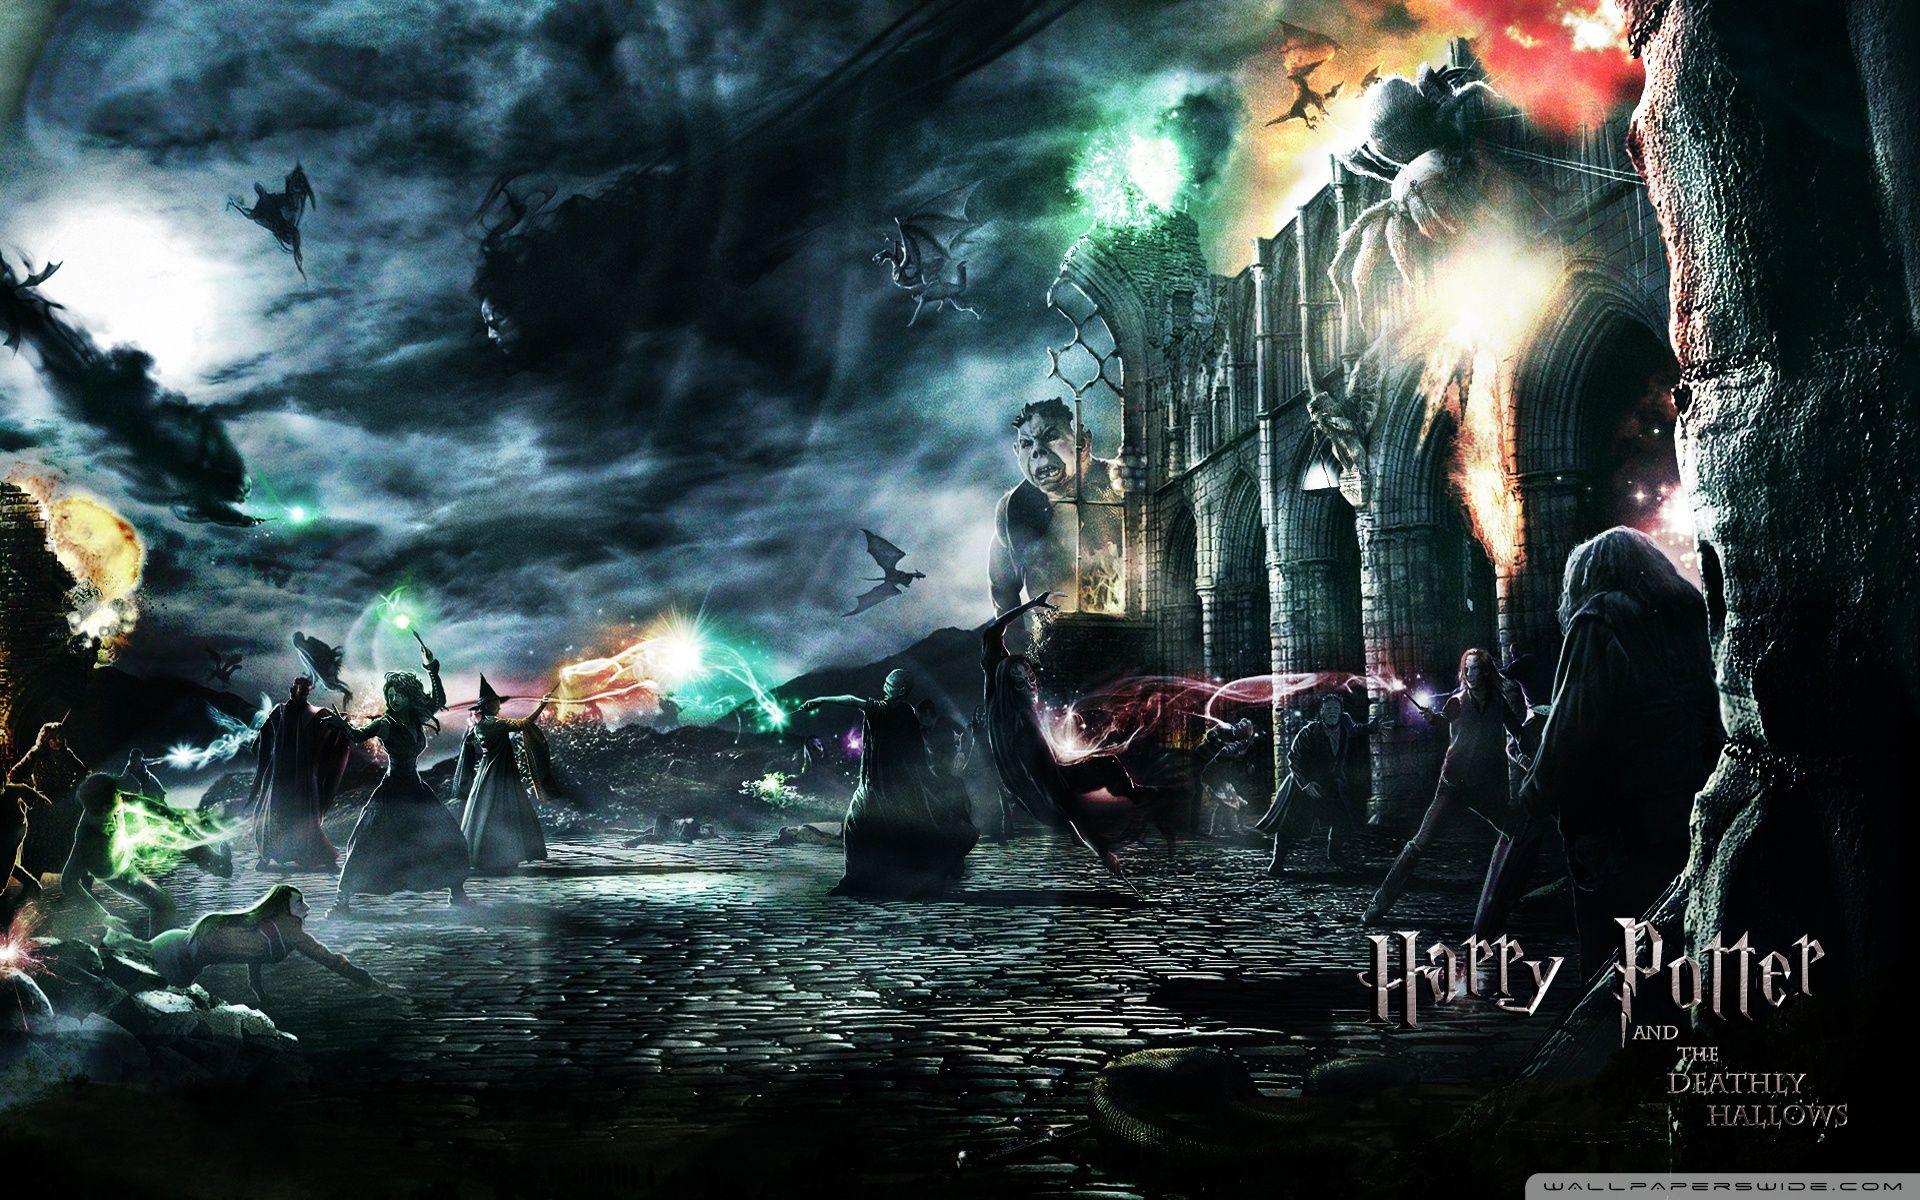 Harry Potter Wallpaper Harry Potter Harry Potter Wallpaper Deathly Hallows Wallpaper Harry Potter